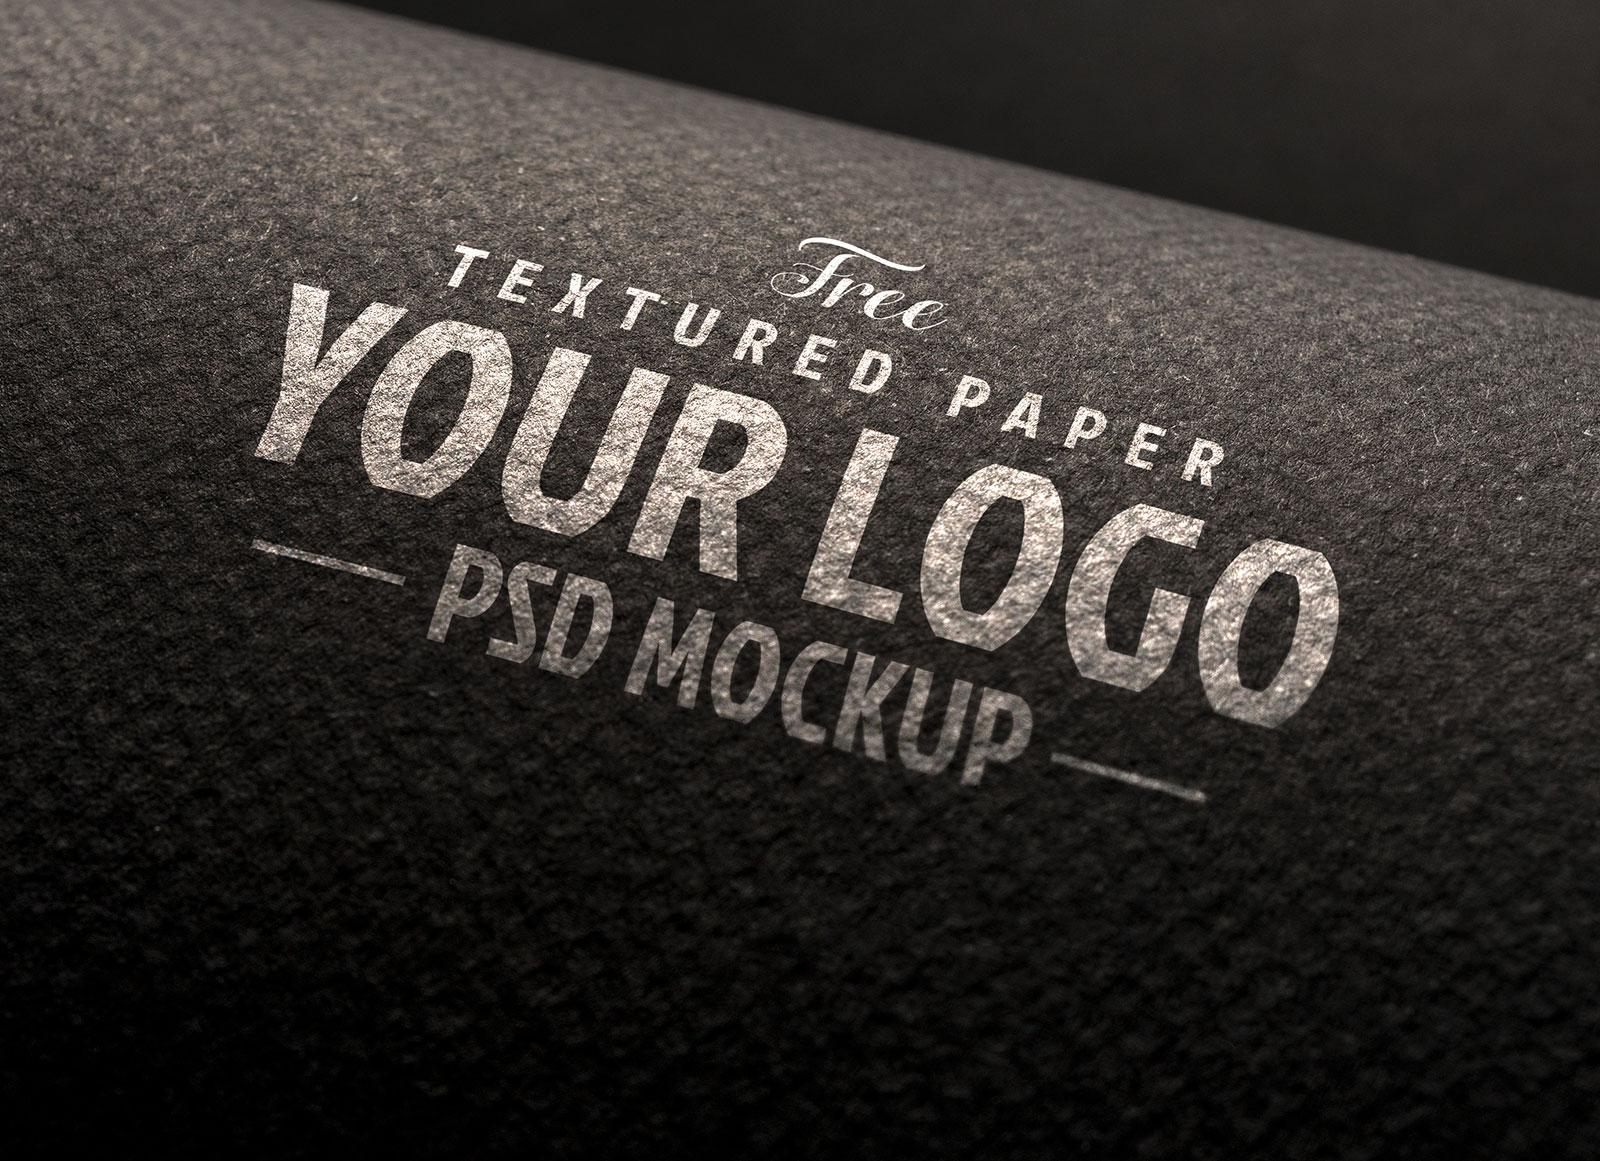 Free Textured Paper Logo Mockup PSD Set (3)